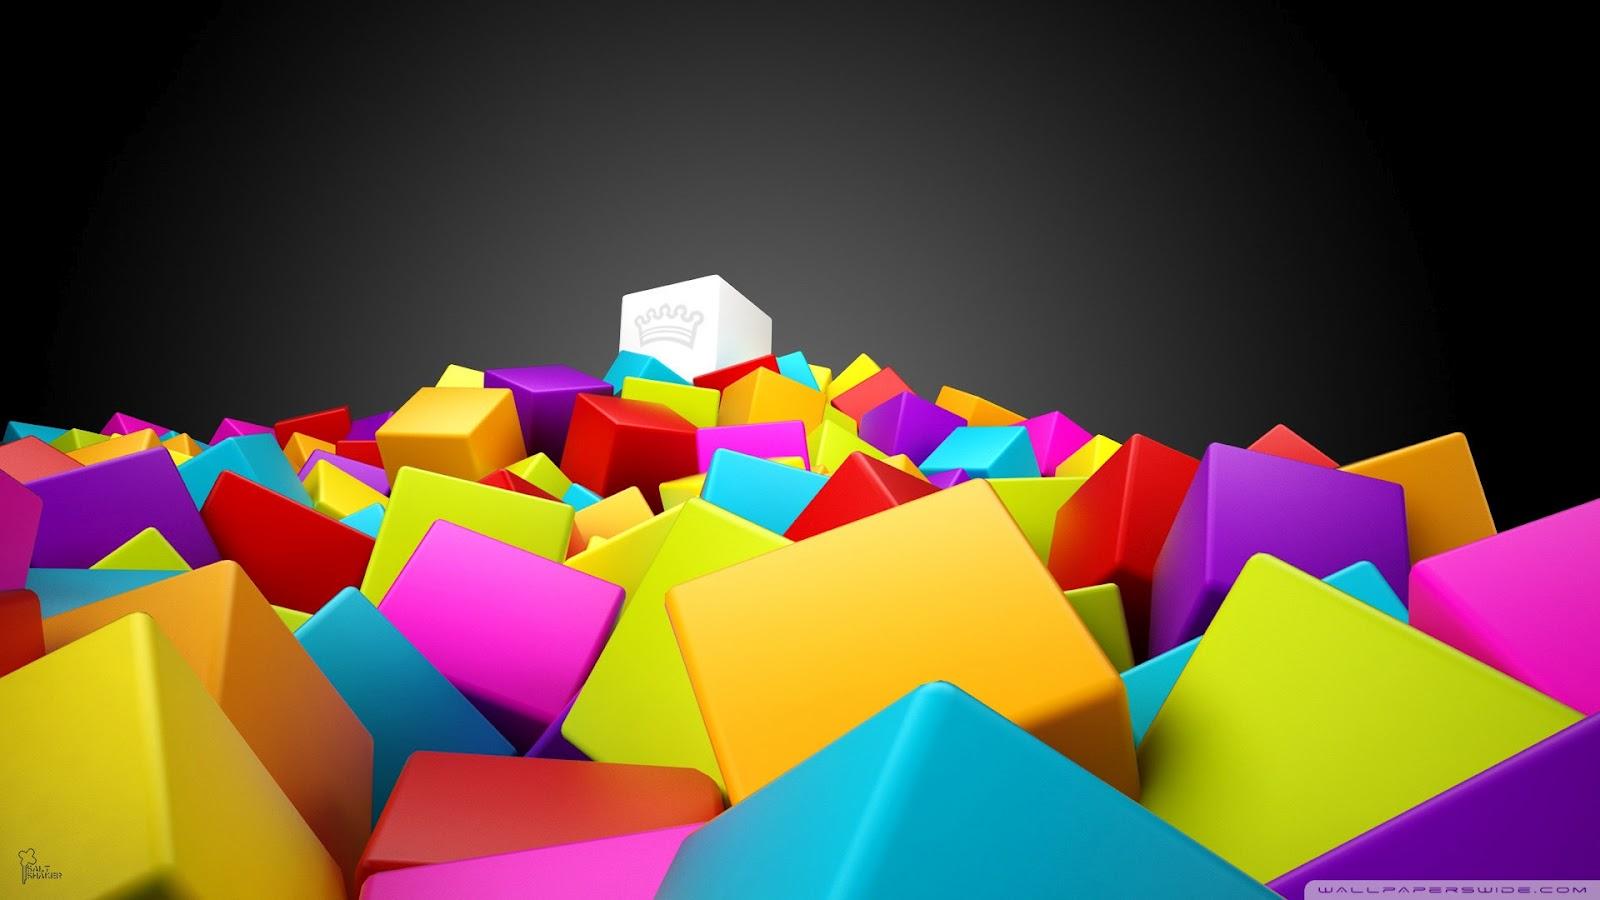 http://4.bp.blogspot.com/-n1FTETjqZTg/UAmSq_Zn-zI/AAAAAAAAAW0/Yfzxc_lQV7o/s1600/colorful_cubes-wallpaper-1920x1080.jpg